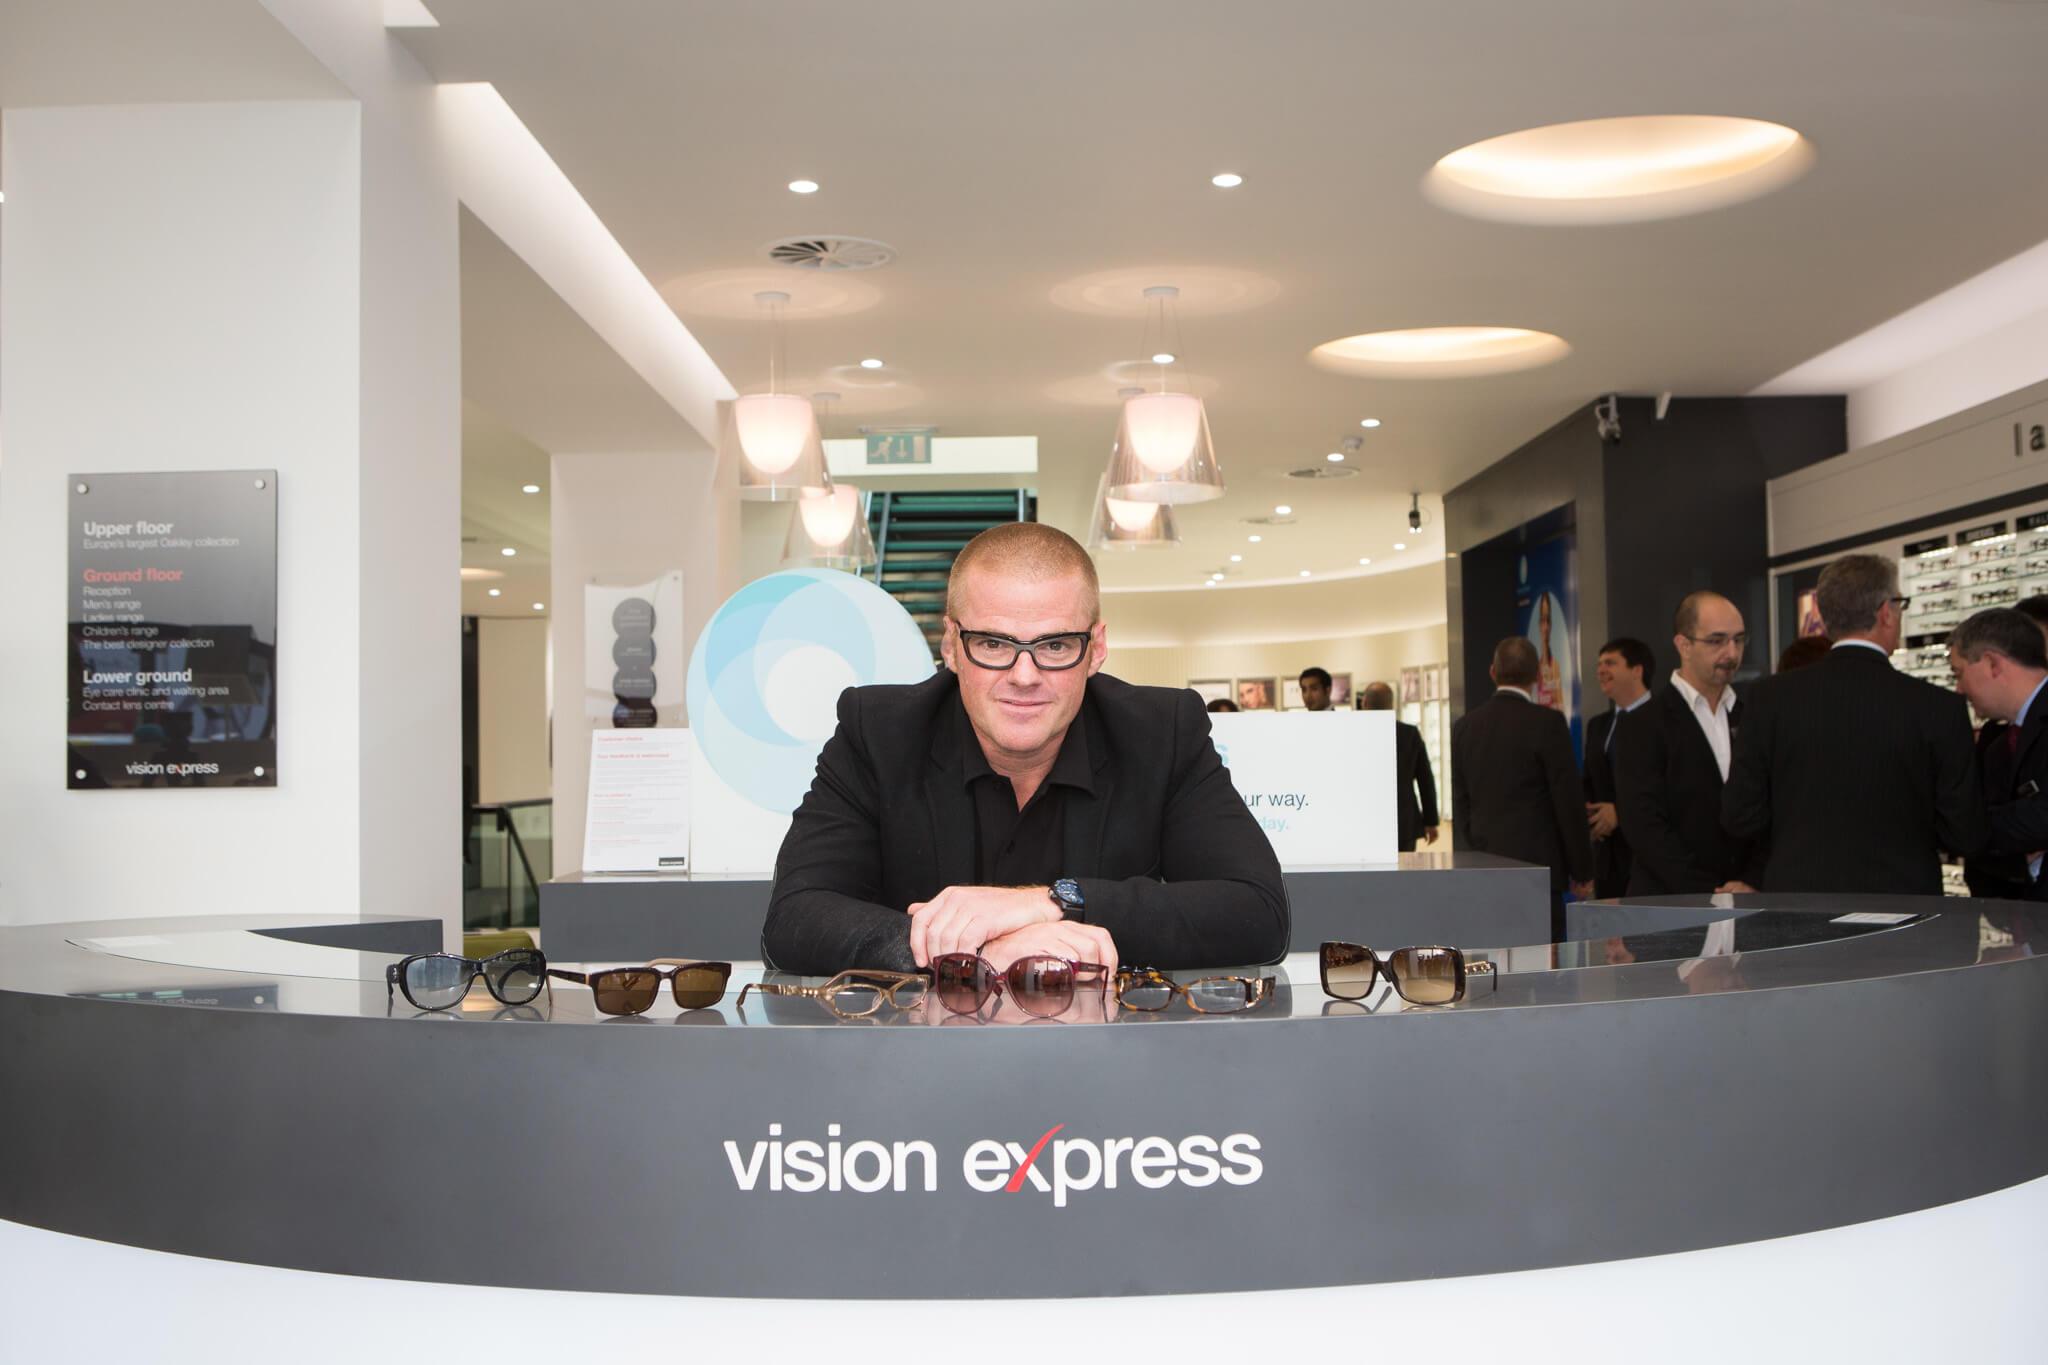 PR-Shoot-Heston-Blumenthal-Vision-Express-store-opening